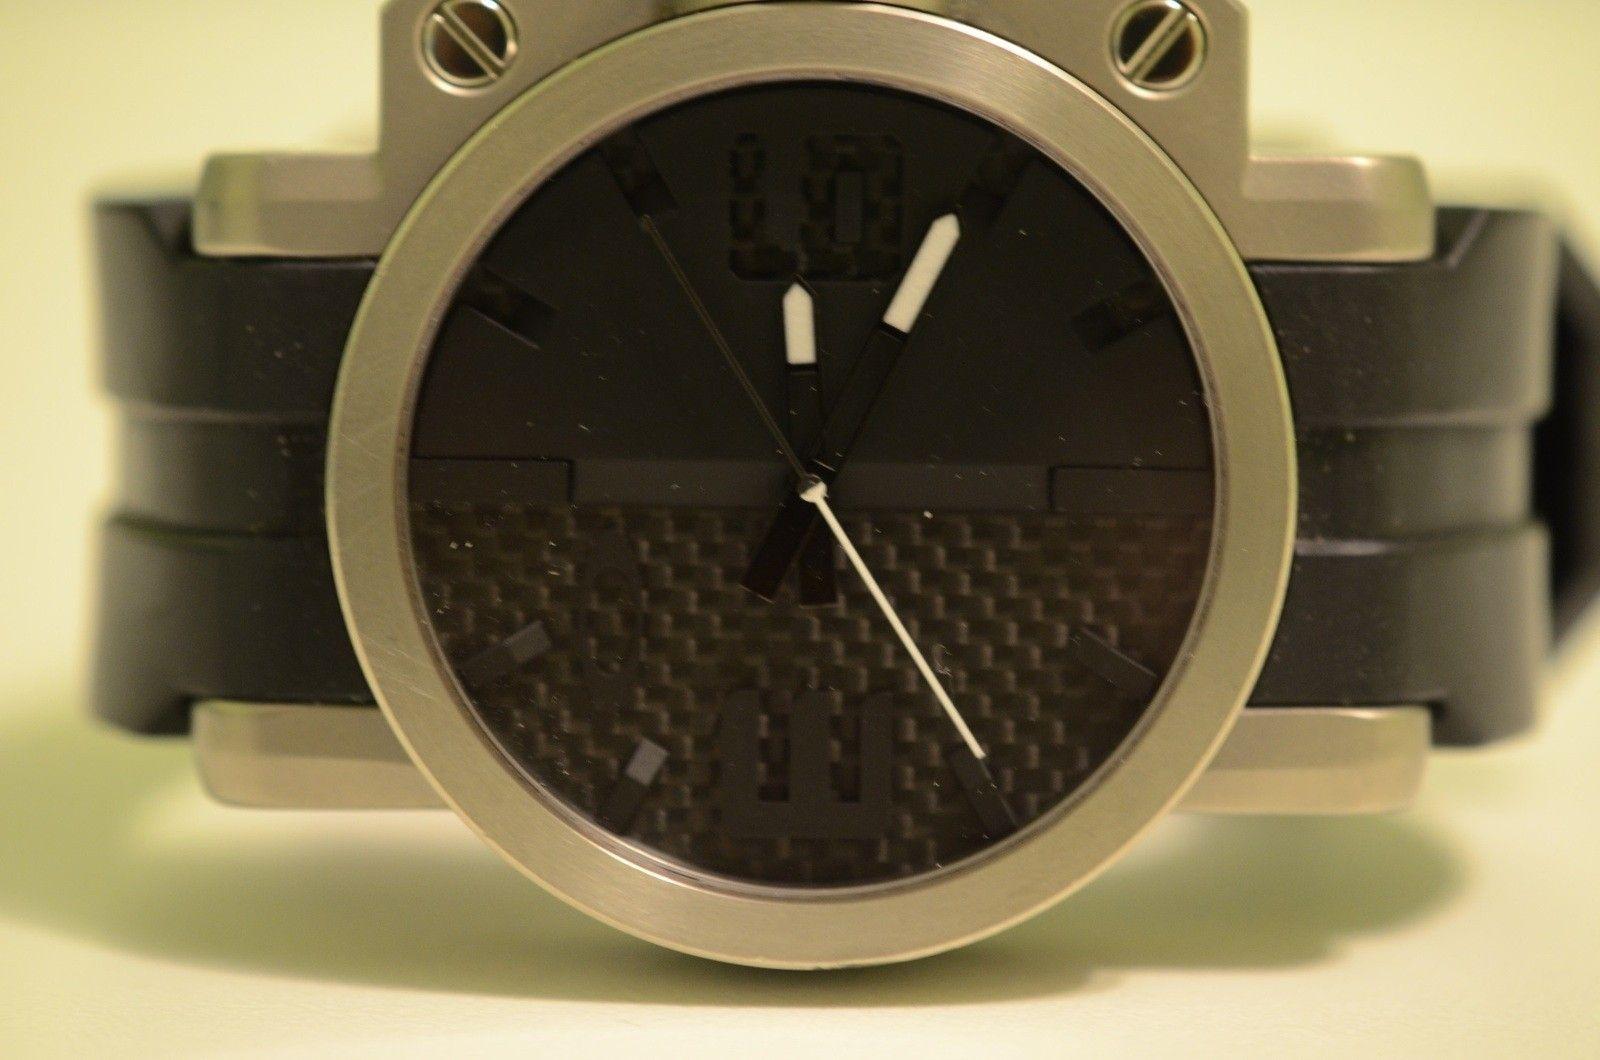 Gearbox Brushed Titanium- Carbon Fiber Dial SOLD! - DSC_0443.JPG